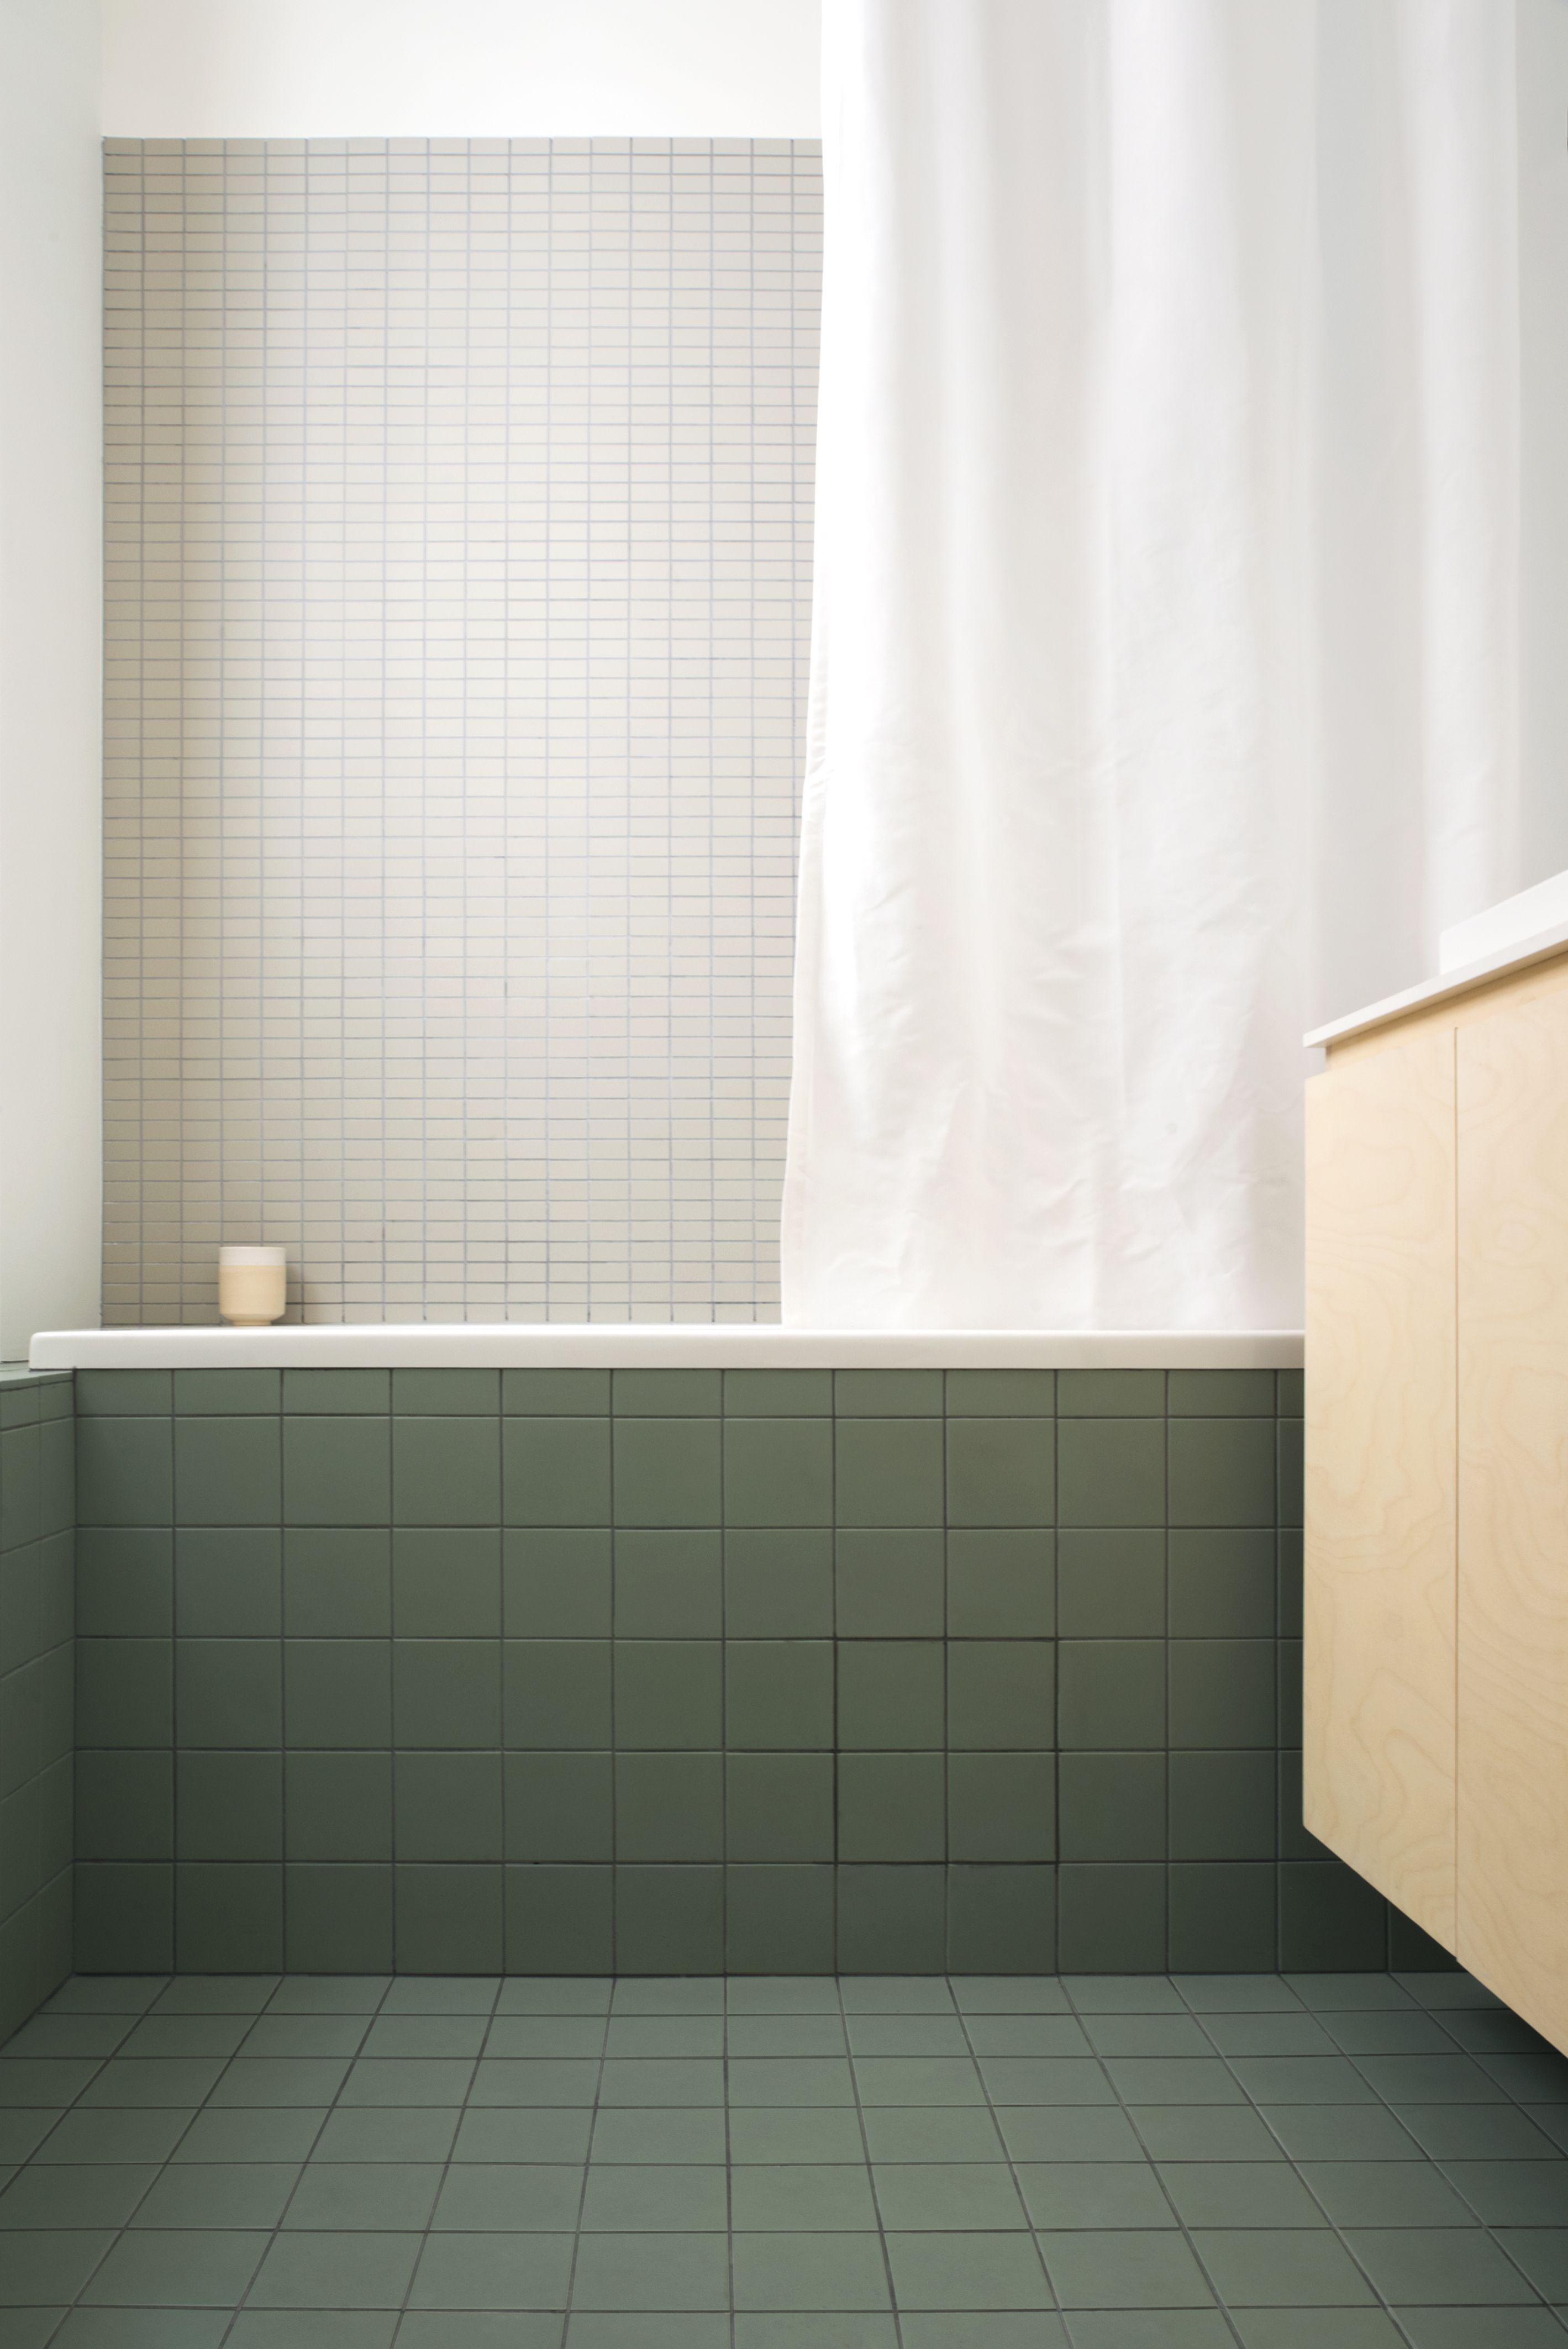 Photo of Tiled bathroom